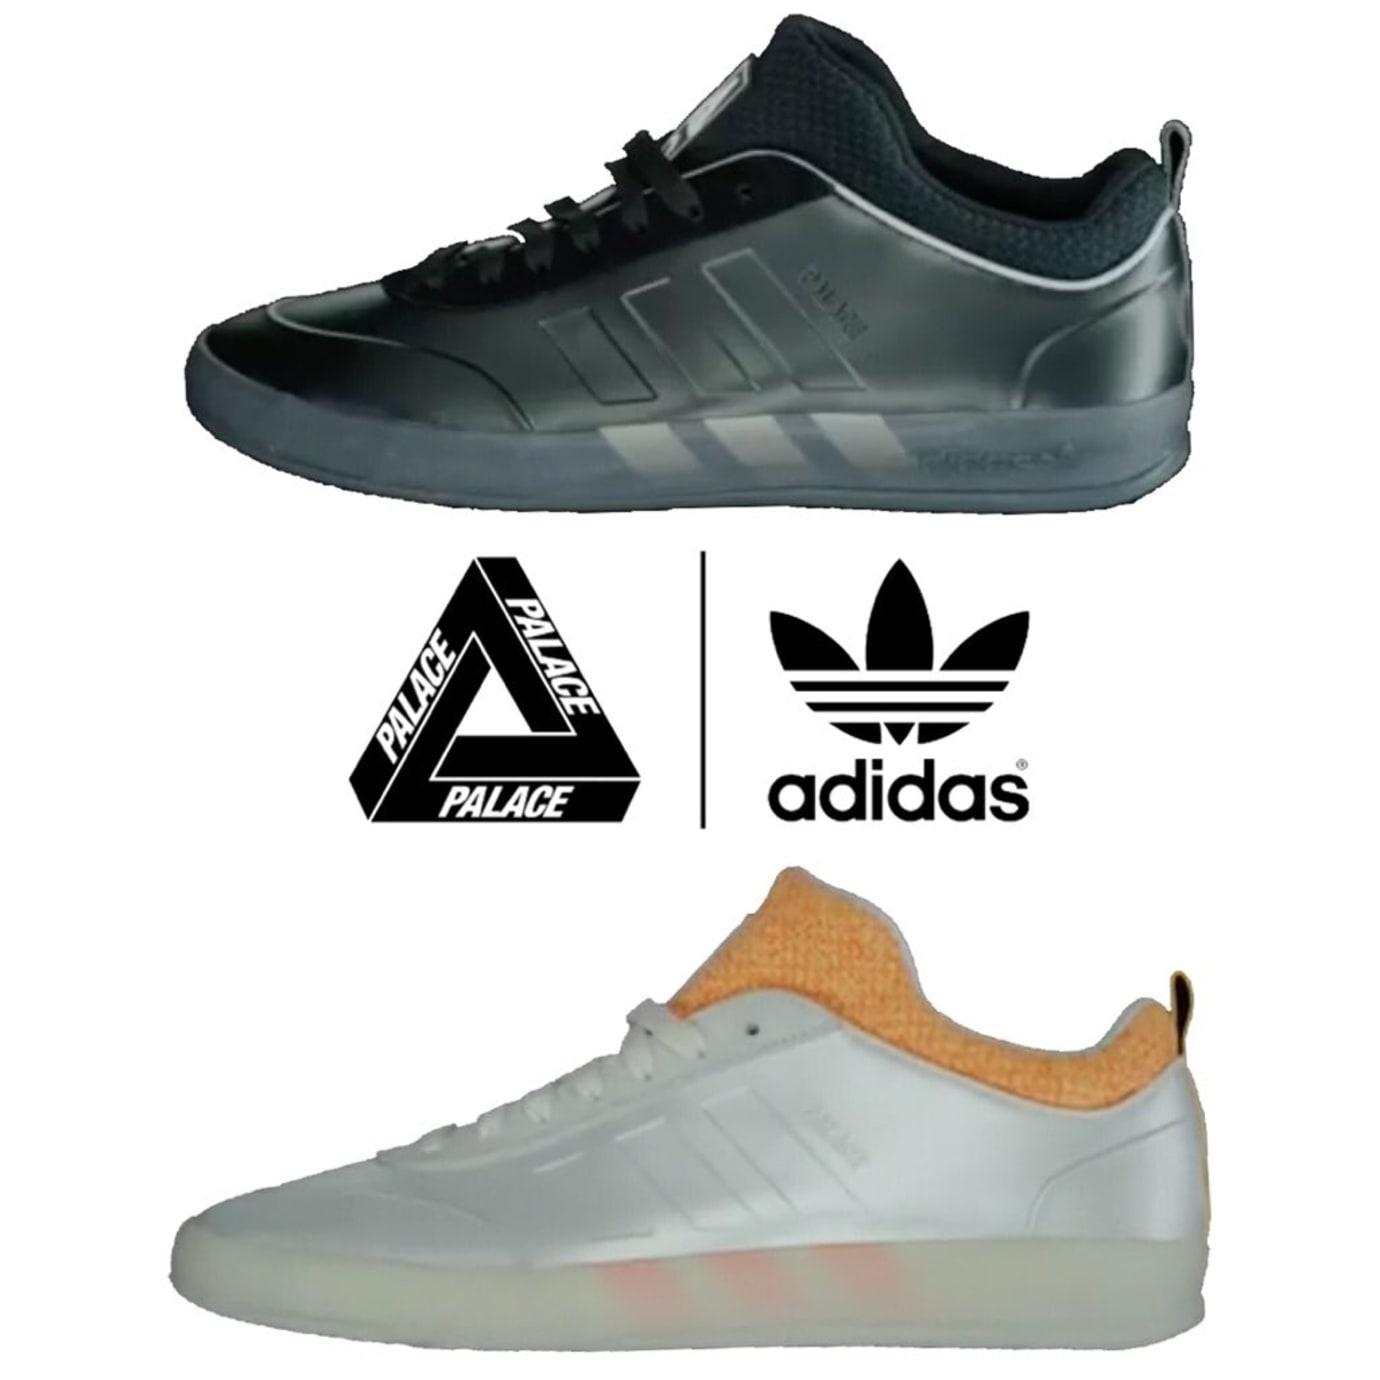 newest a8a51 b4339 Adidas Palace Pro 2  Aqua Technical  Collaboration